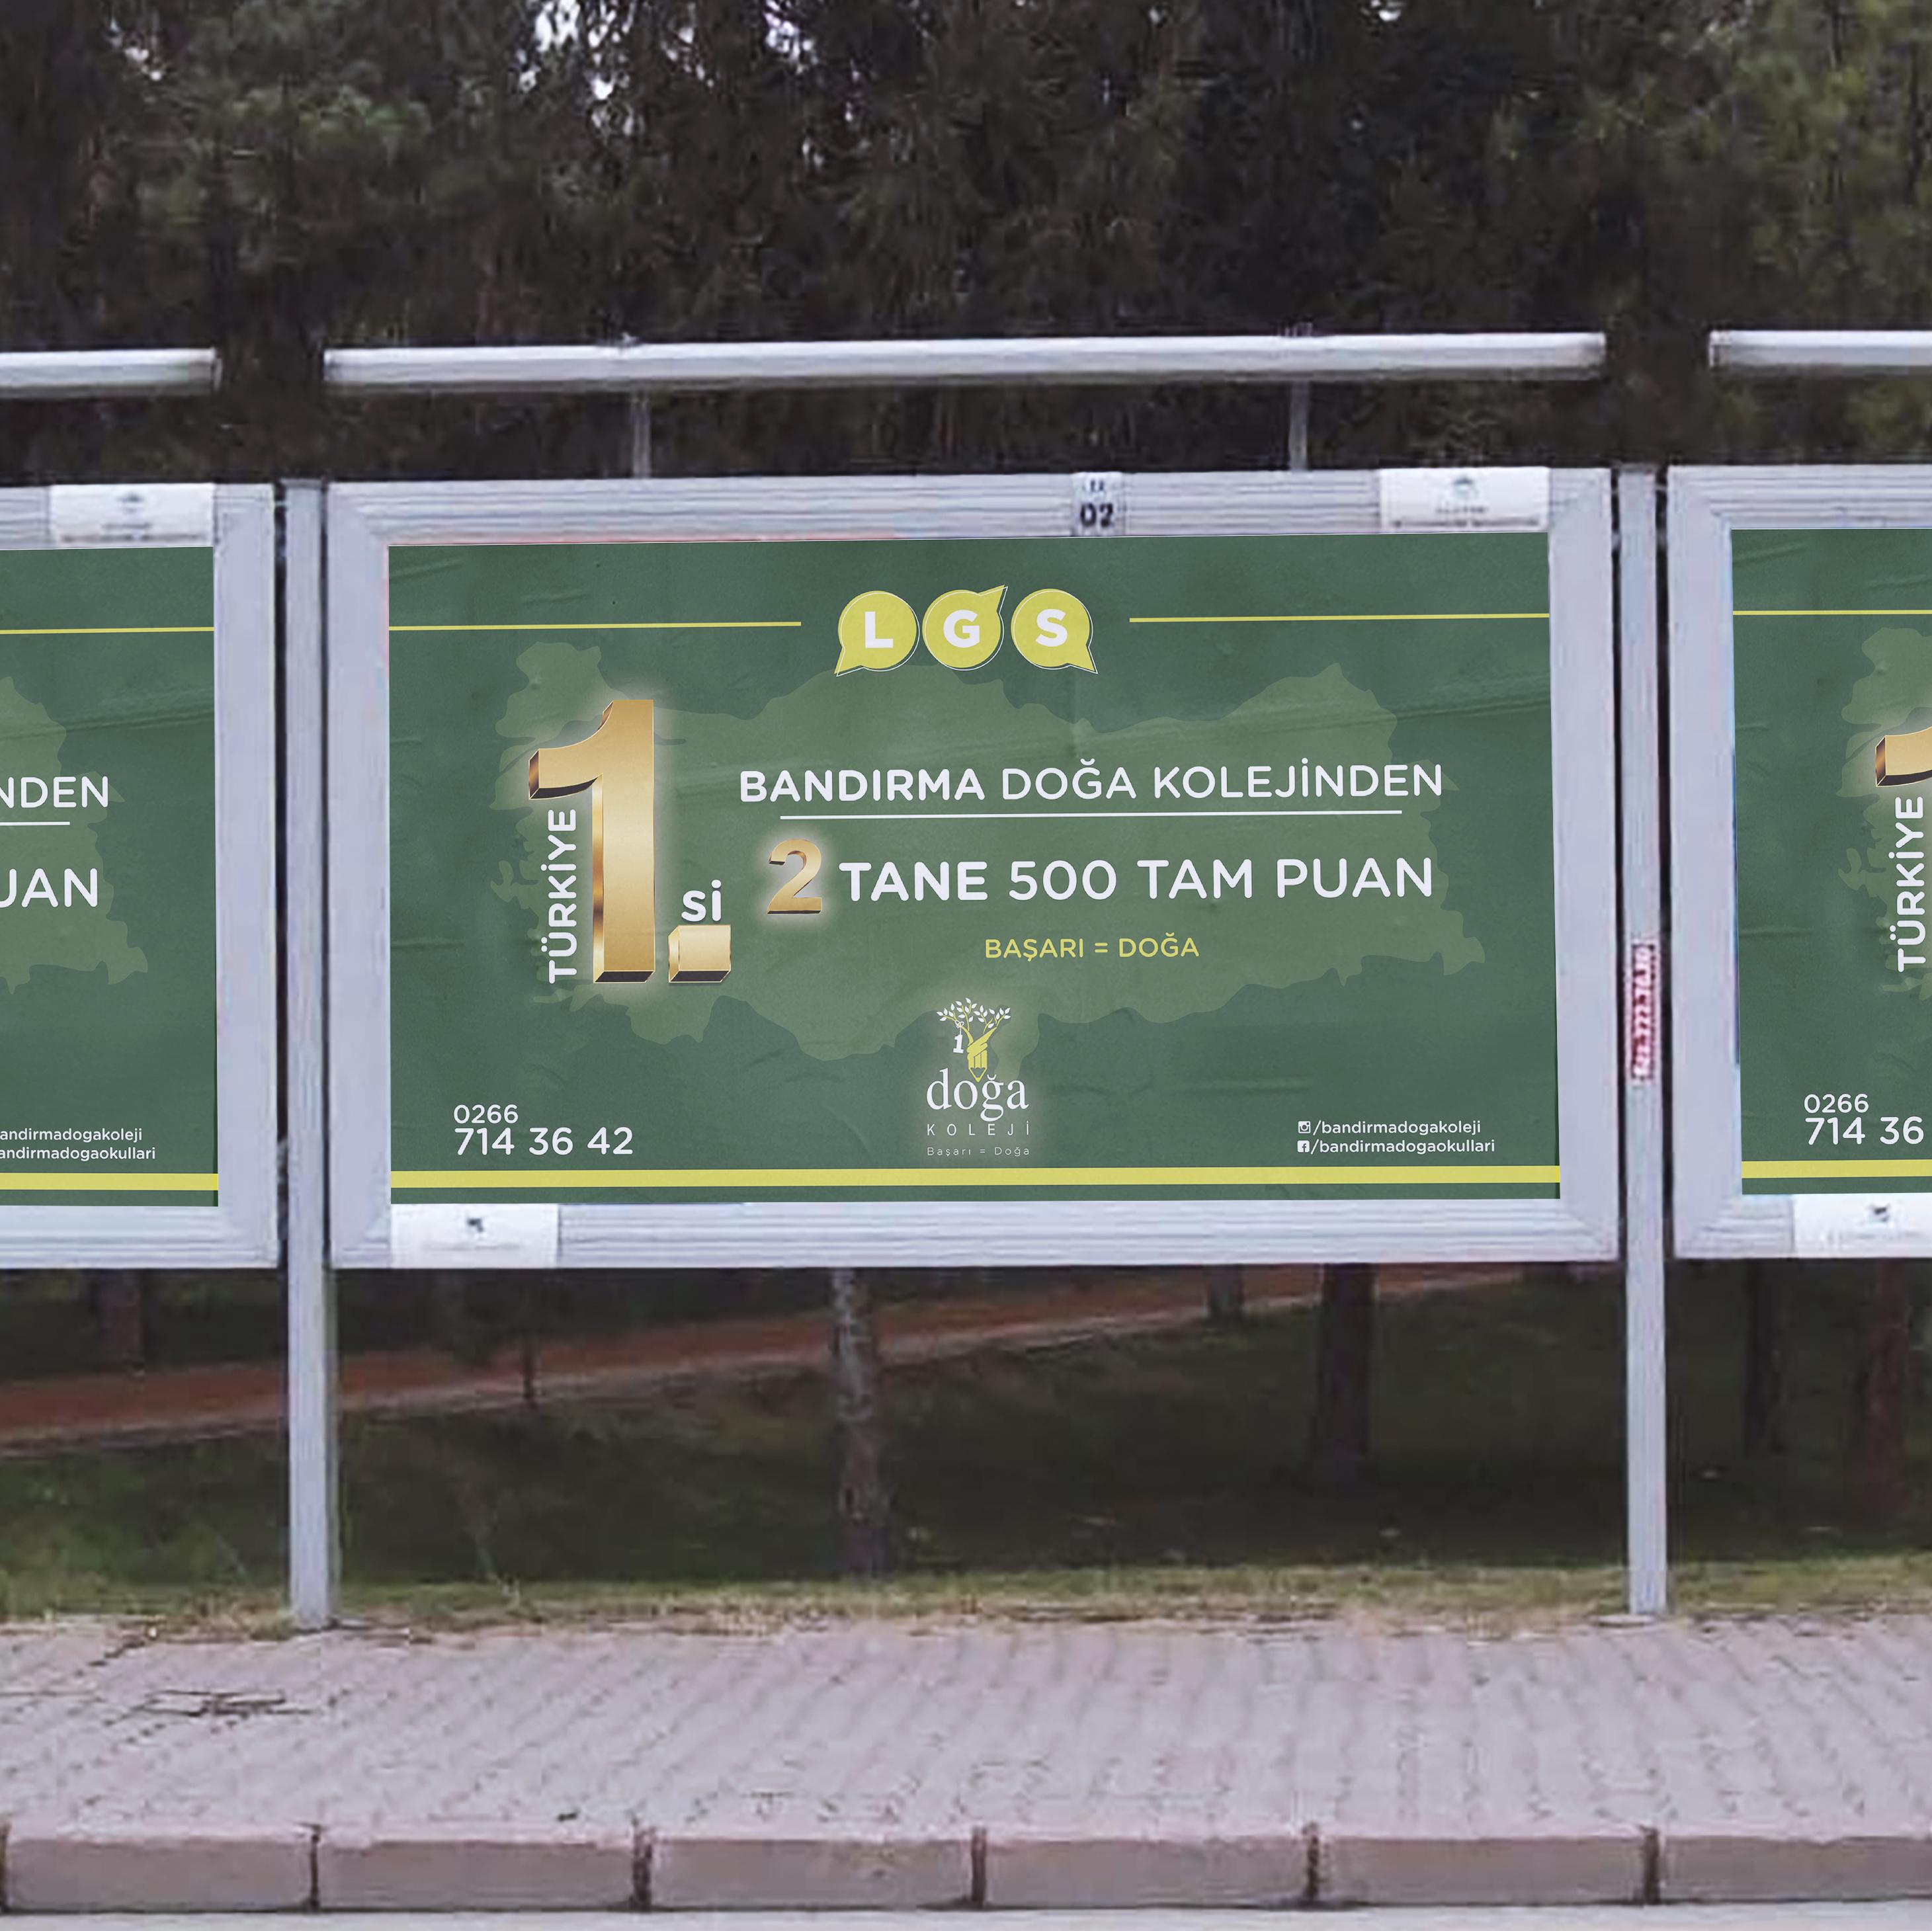 Doğa Koleji Billboard